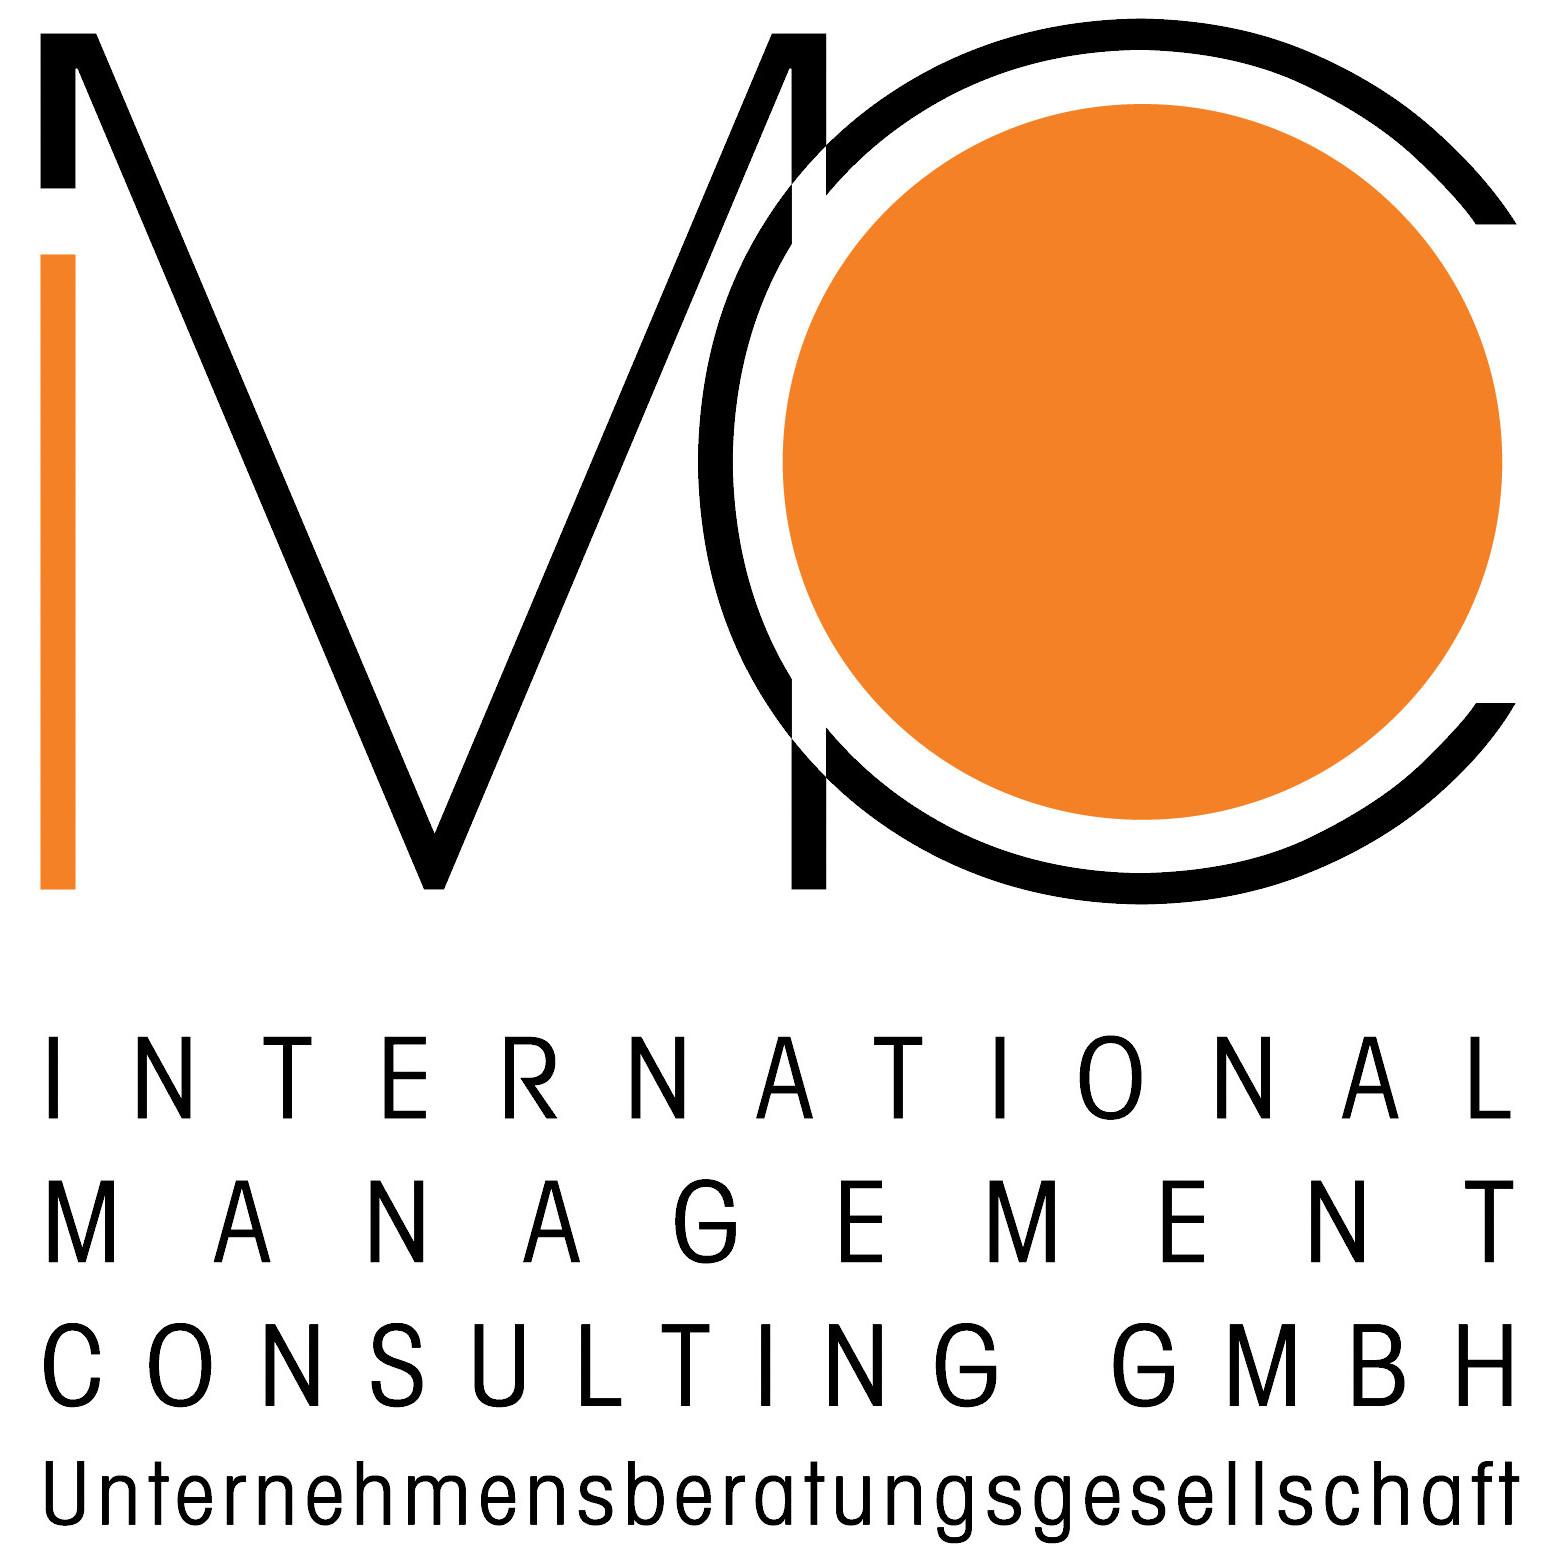 International Management Consulting GmbH